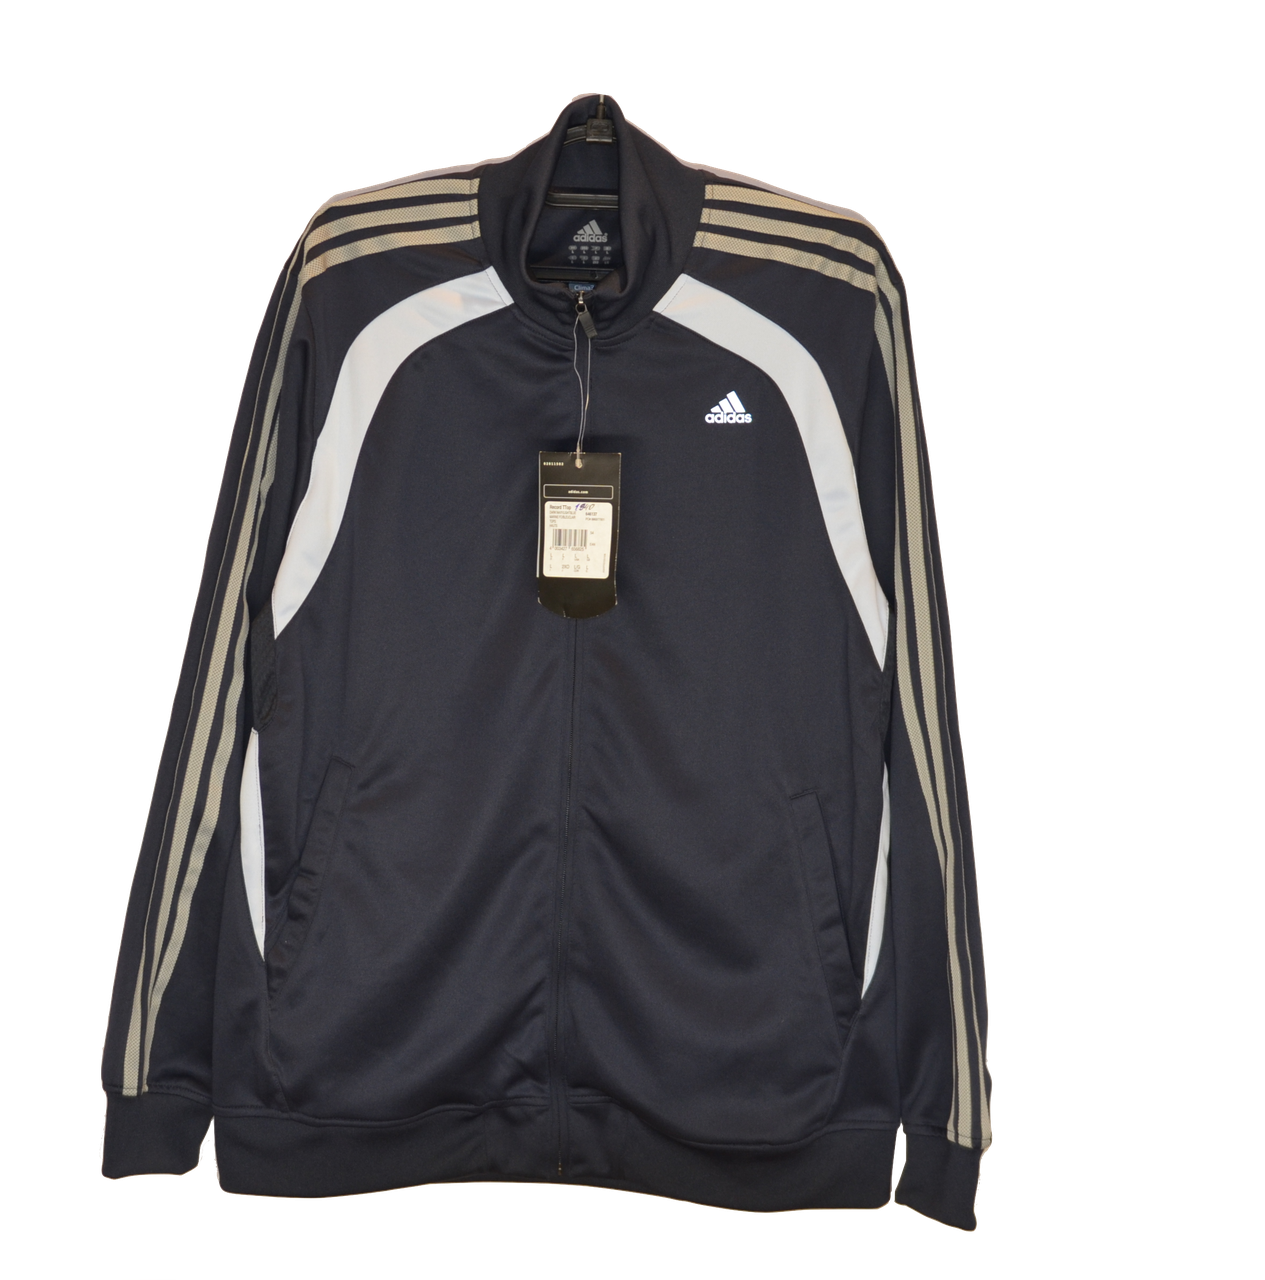 Мужская спортивная кофта Adidas ClimaLite